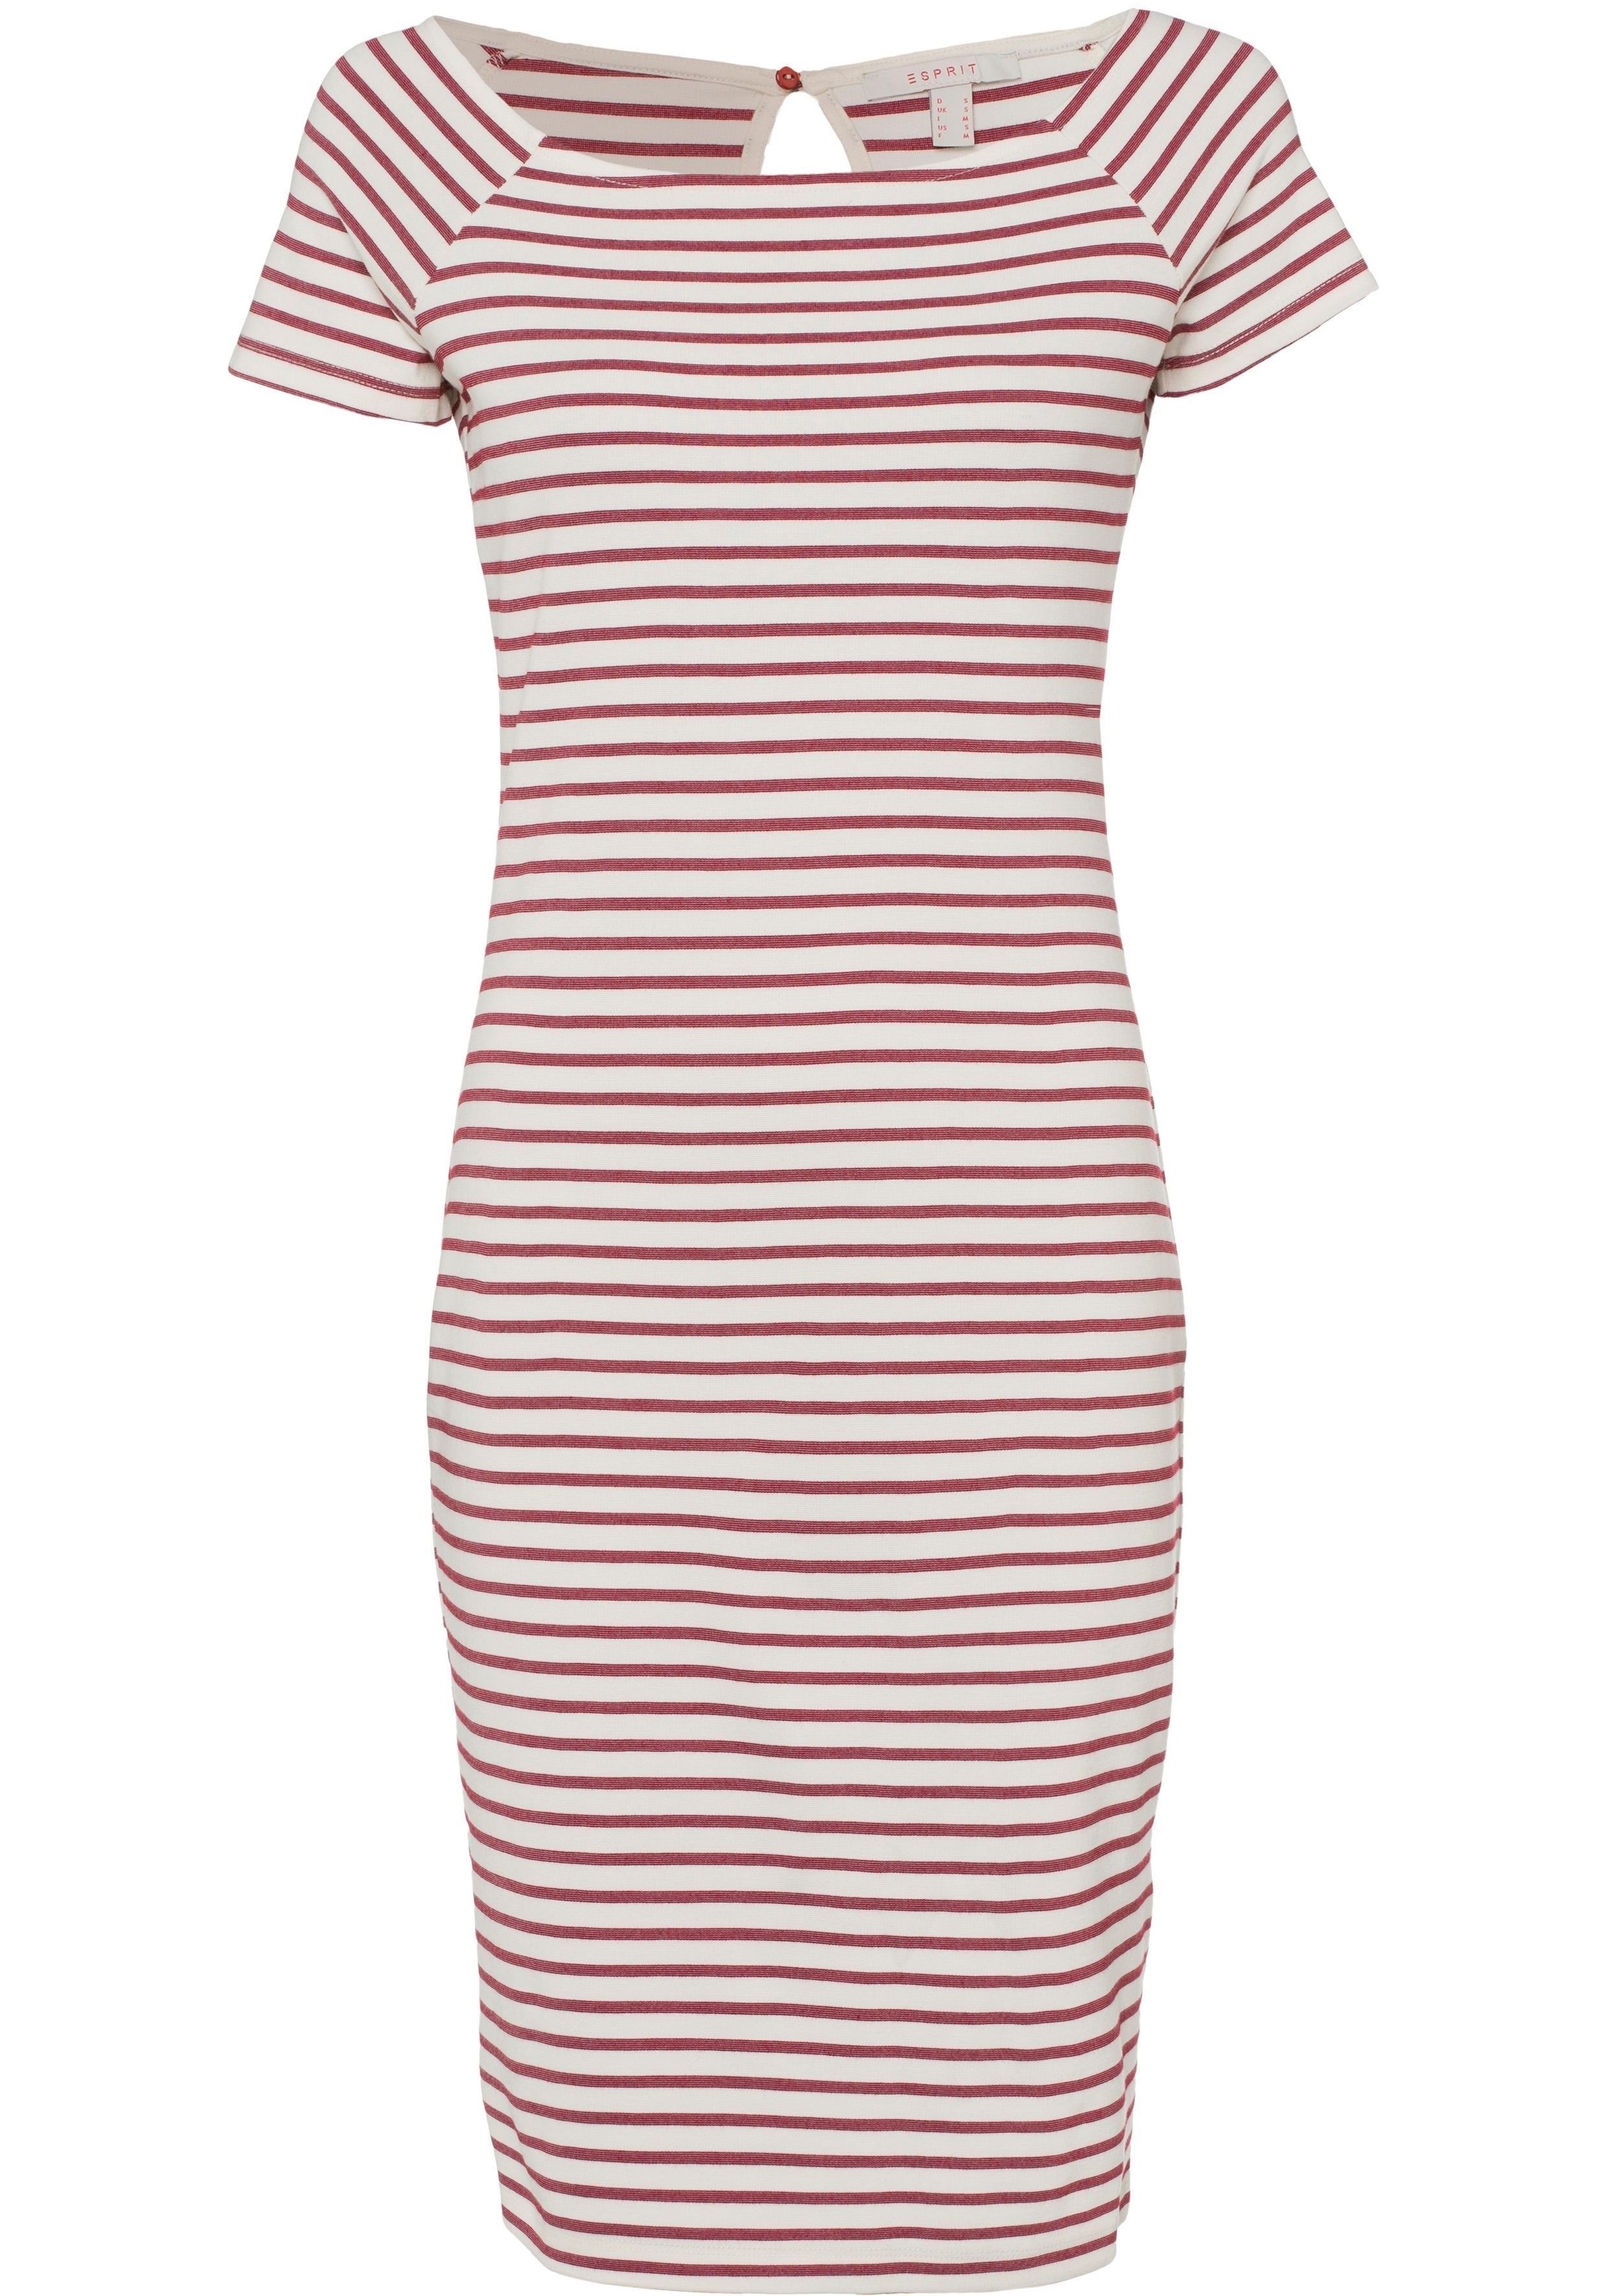 ESPRIT mini-jurk - gratis ruilen op otto.nl